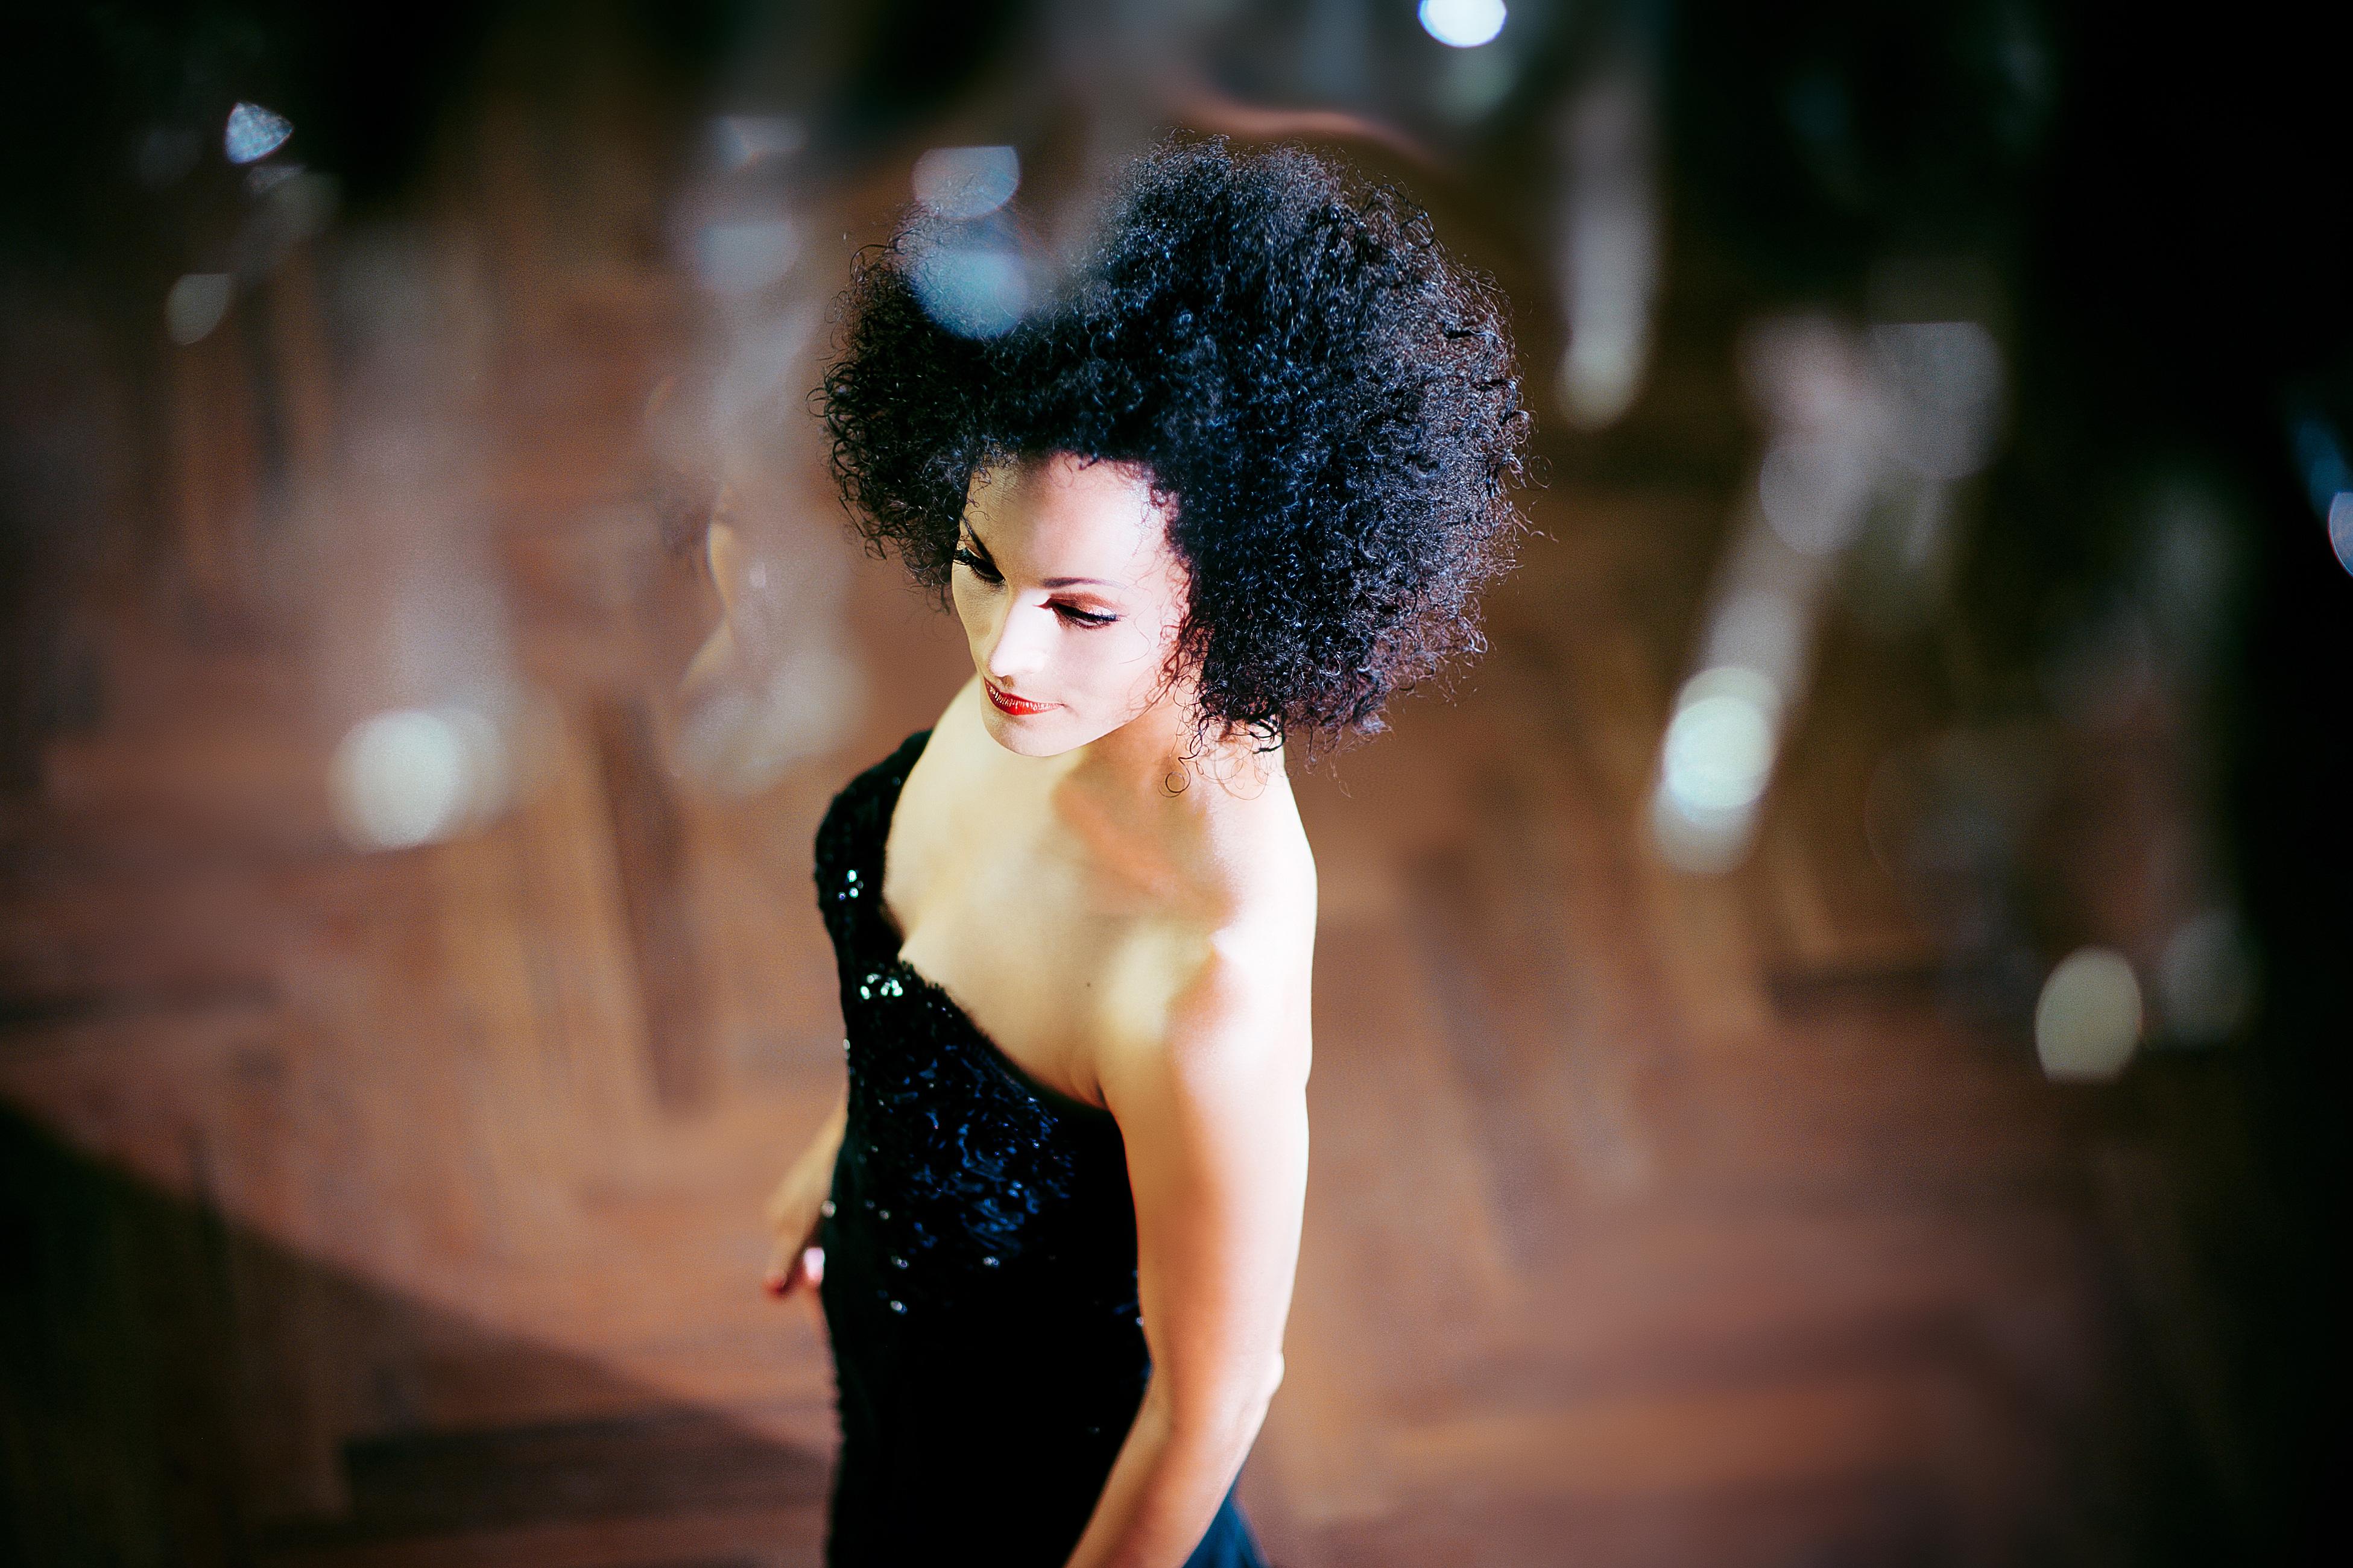 Die Sängerin AZA aka Ariane Roth